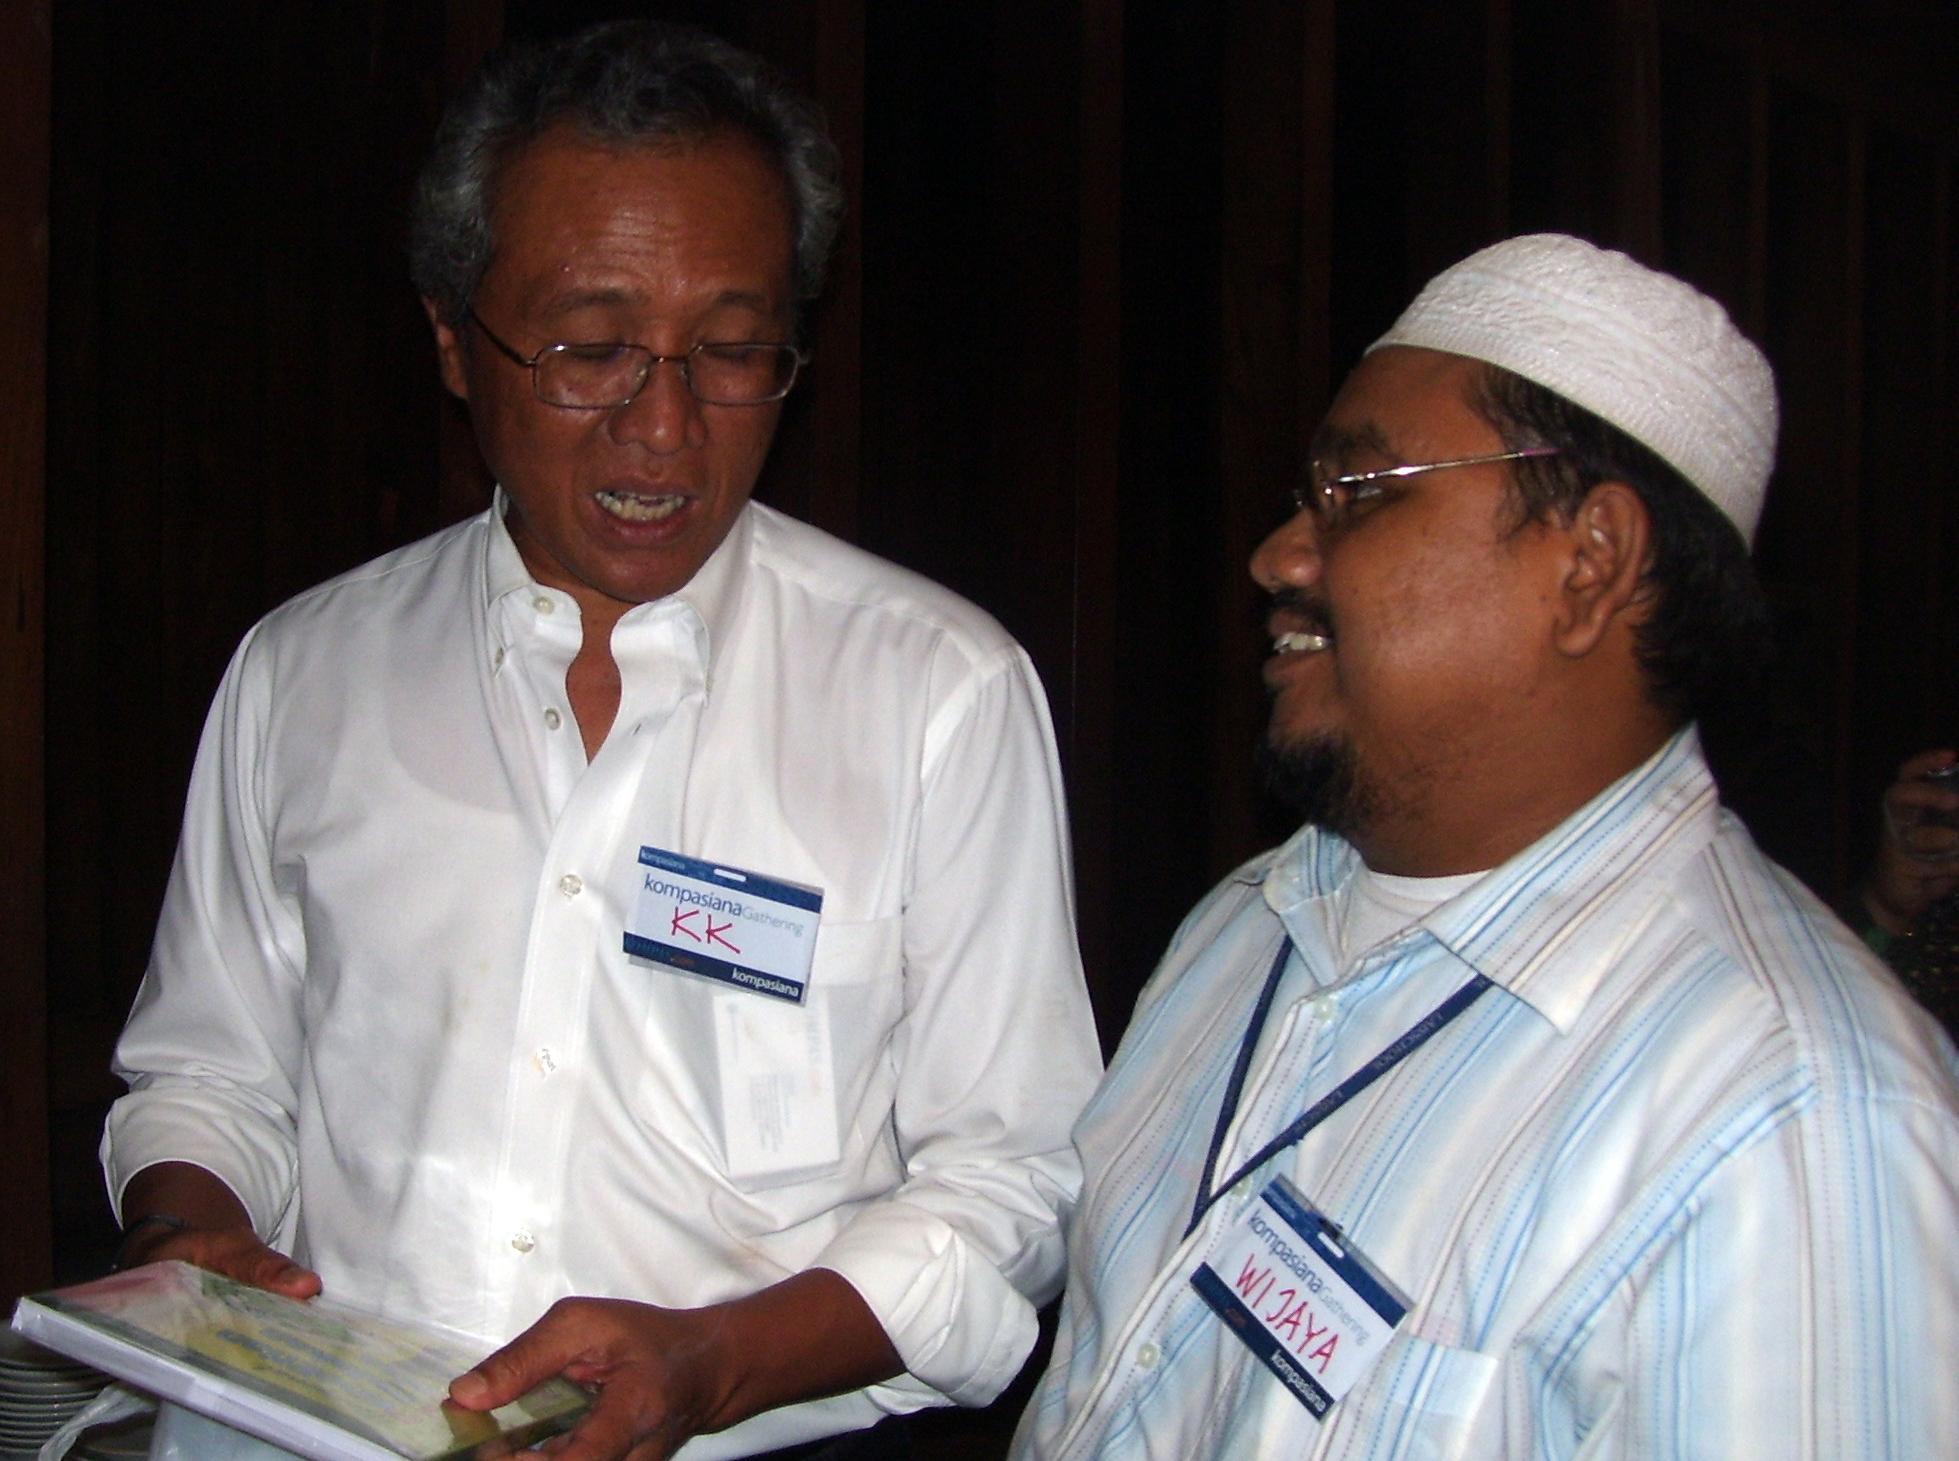 Memberikan Buku PTK kepada Menristek RI, bapak Kusmayanto Kadiman